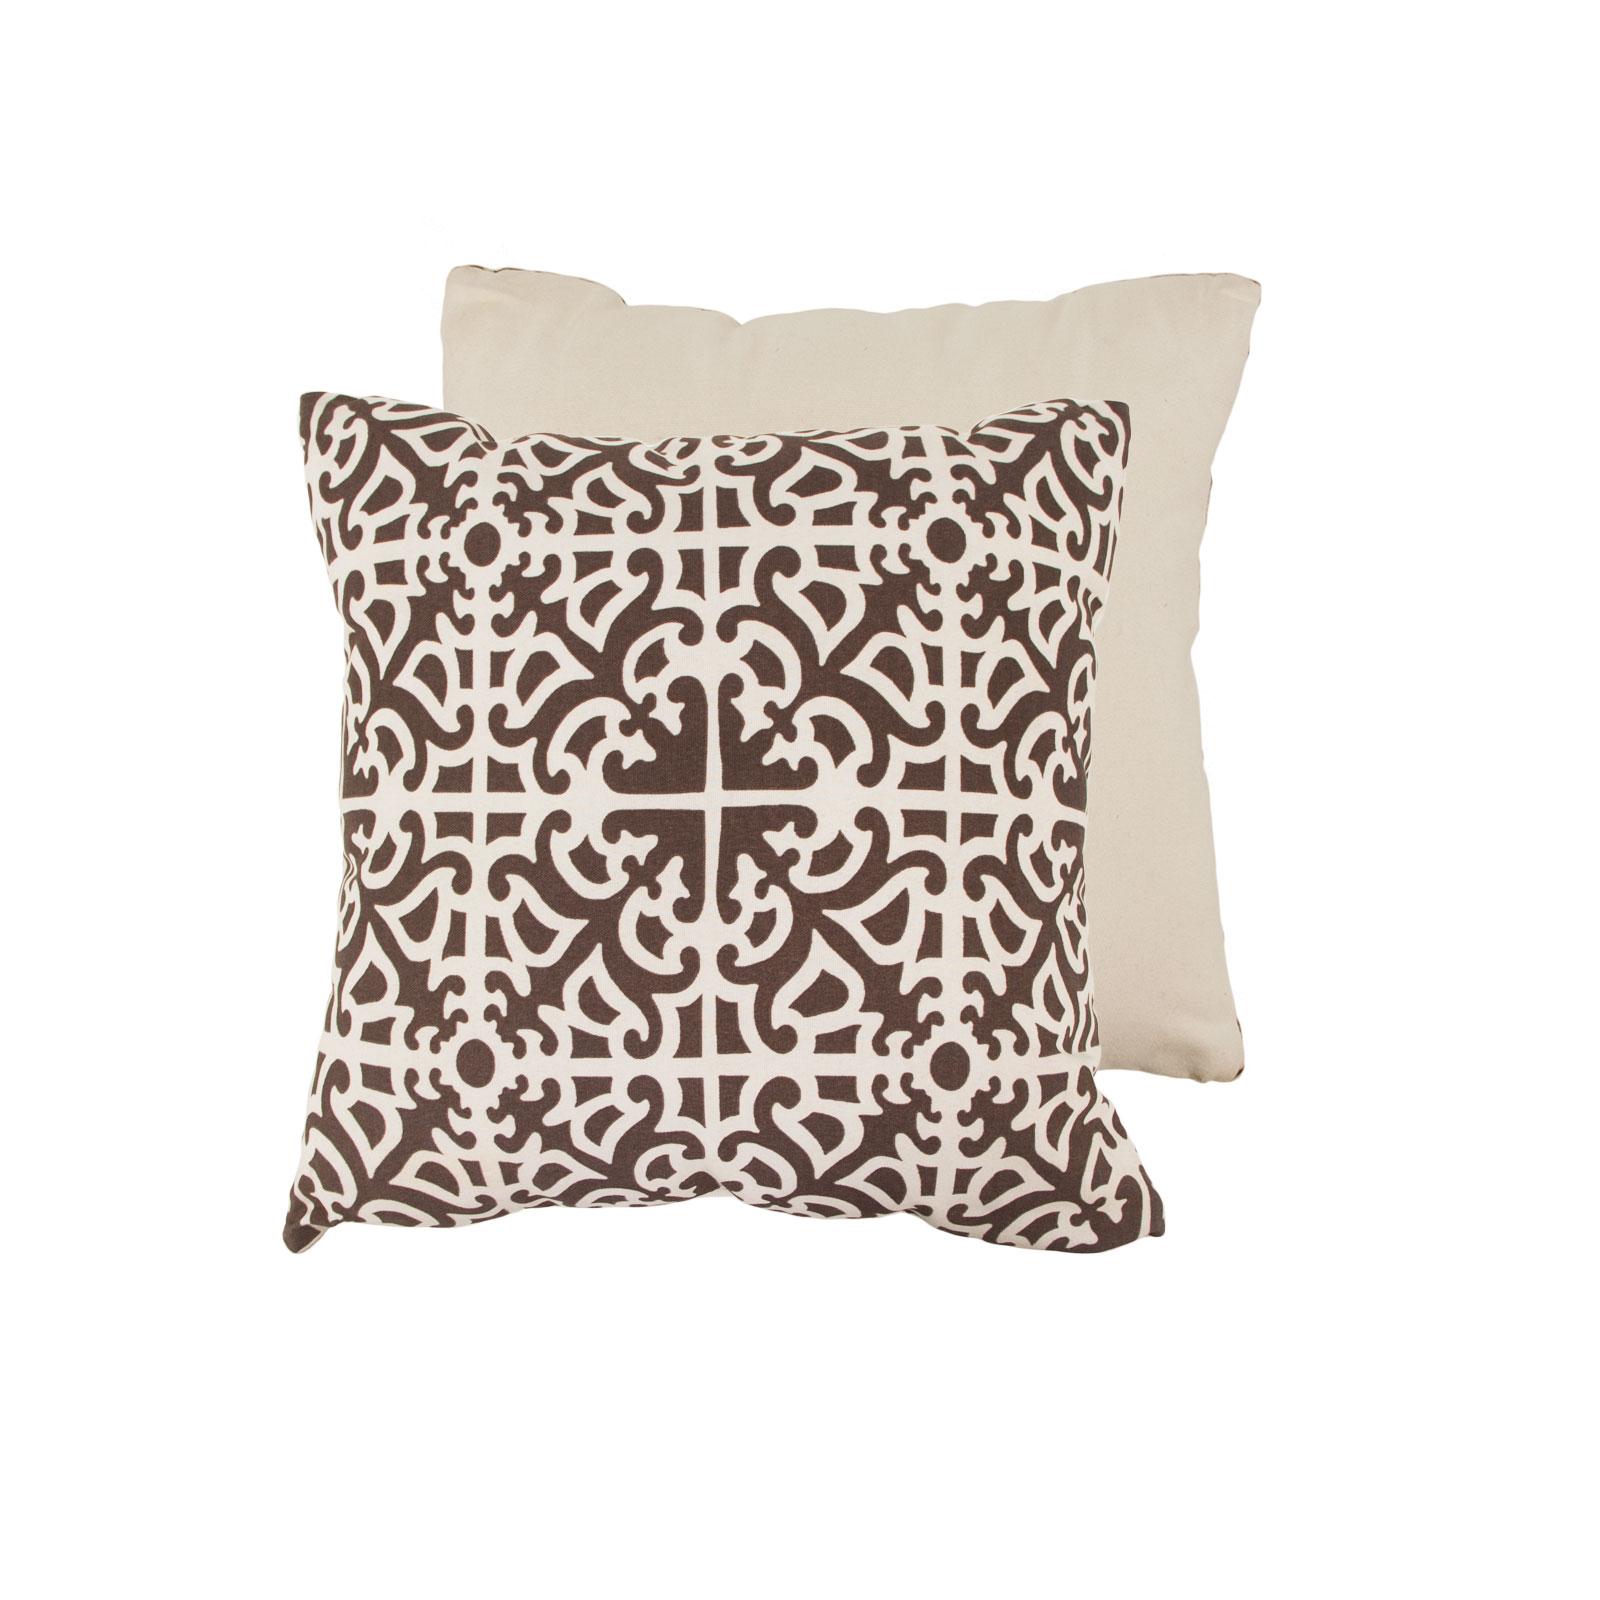 Morocco Pillow (Brown) - FormDecor